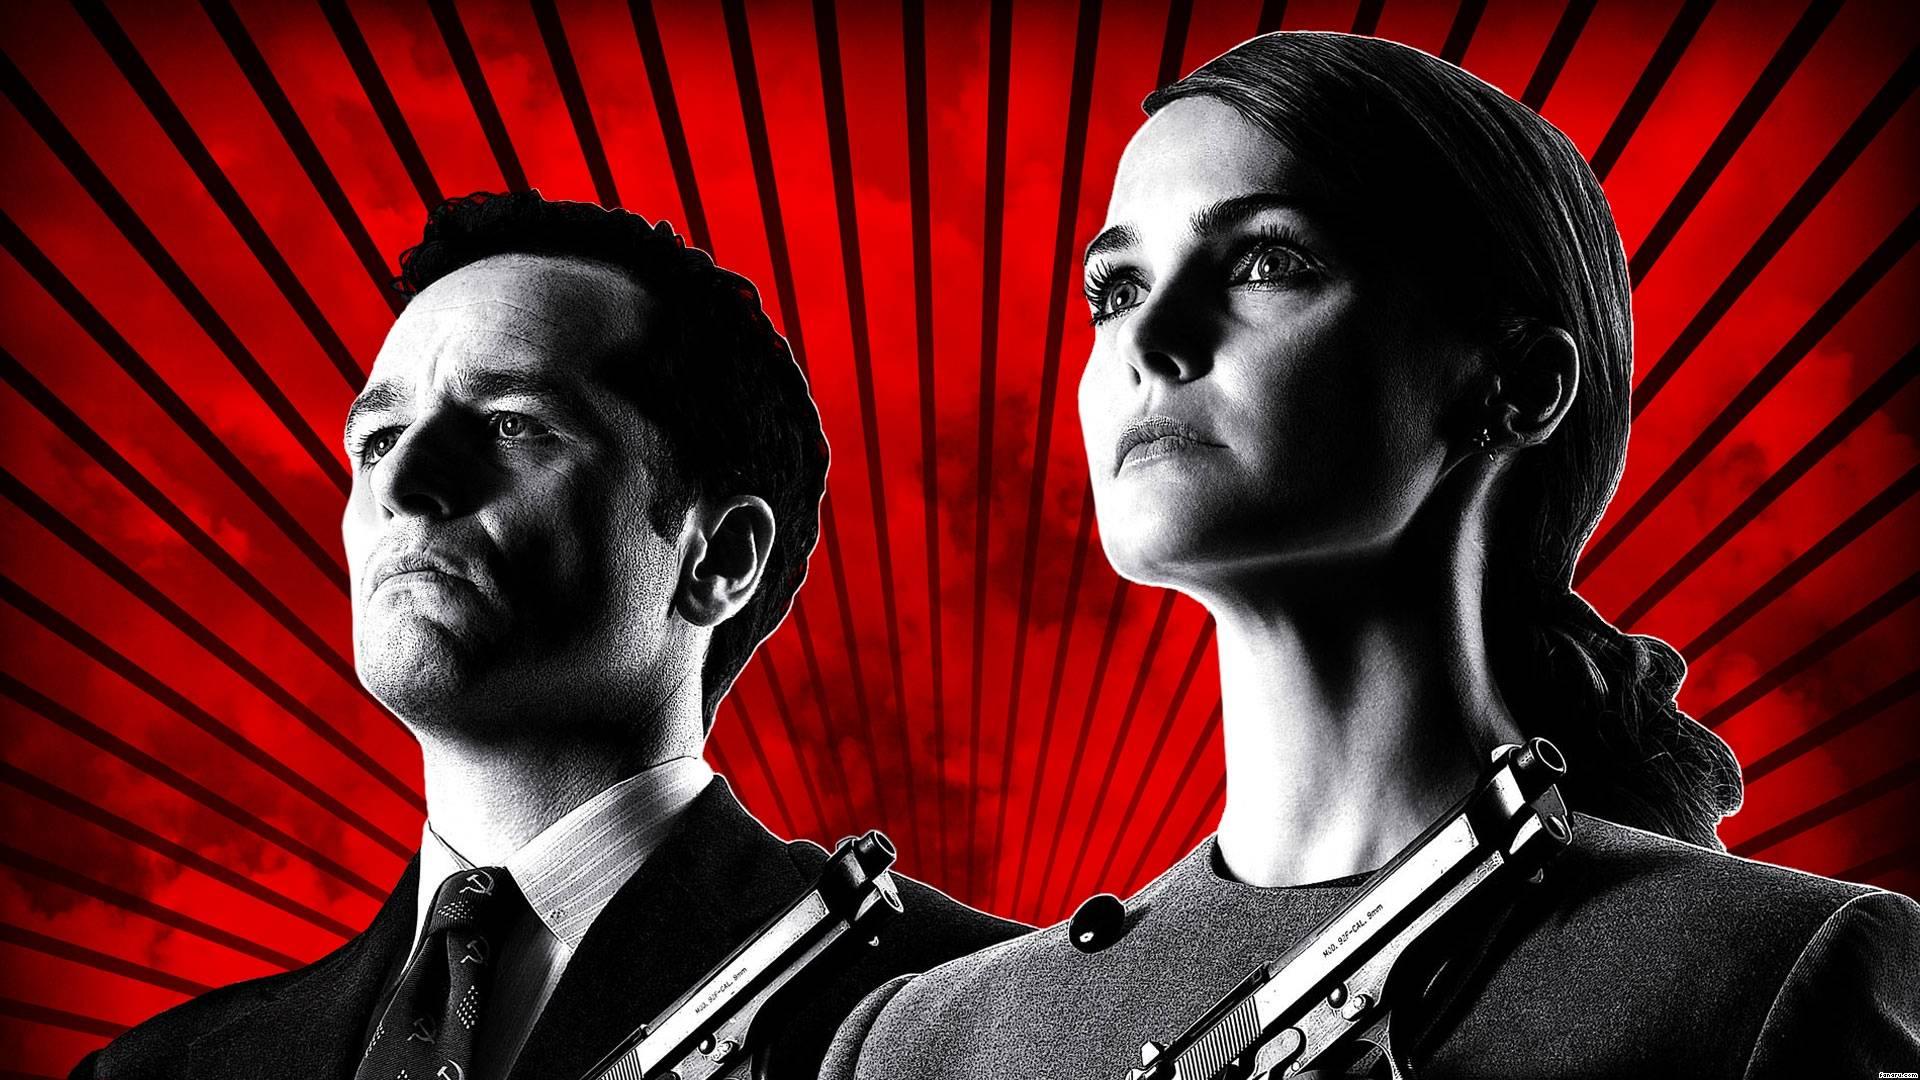 Sex, Secrecy and Spying - Matthew Rhys on The Americans Season Three